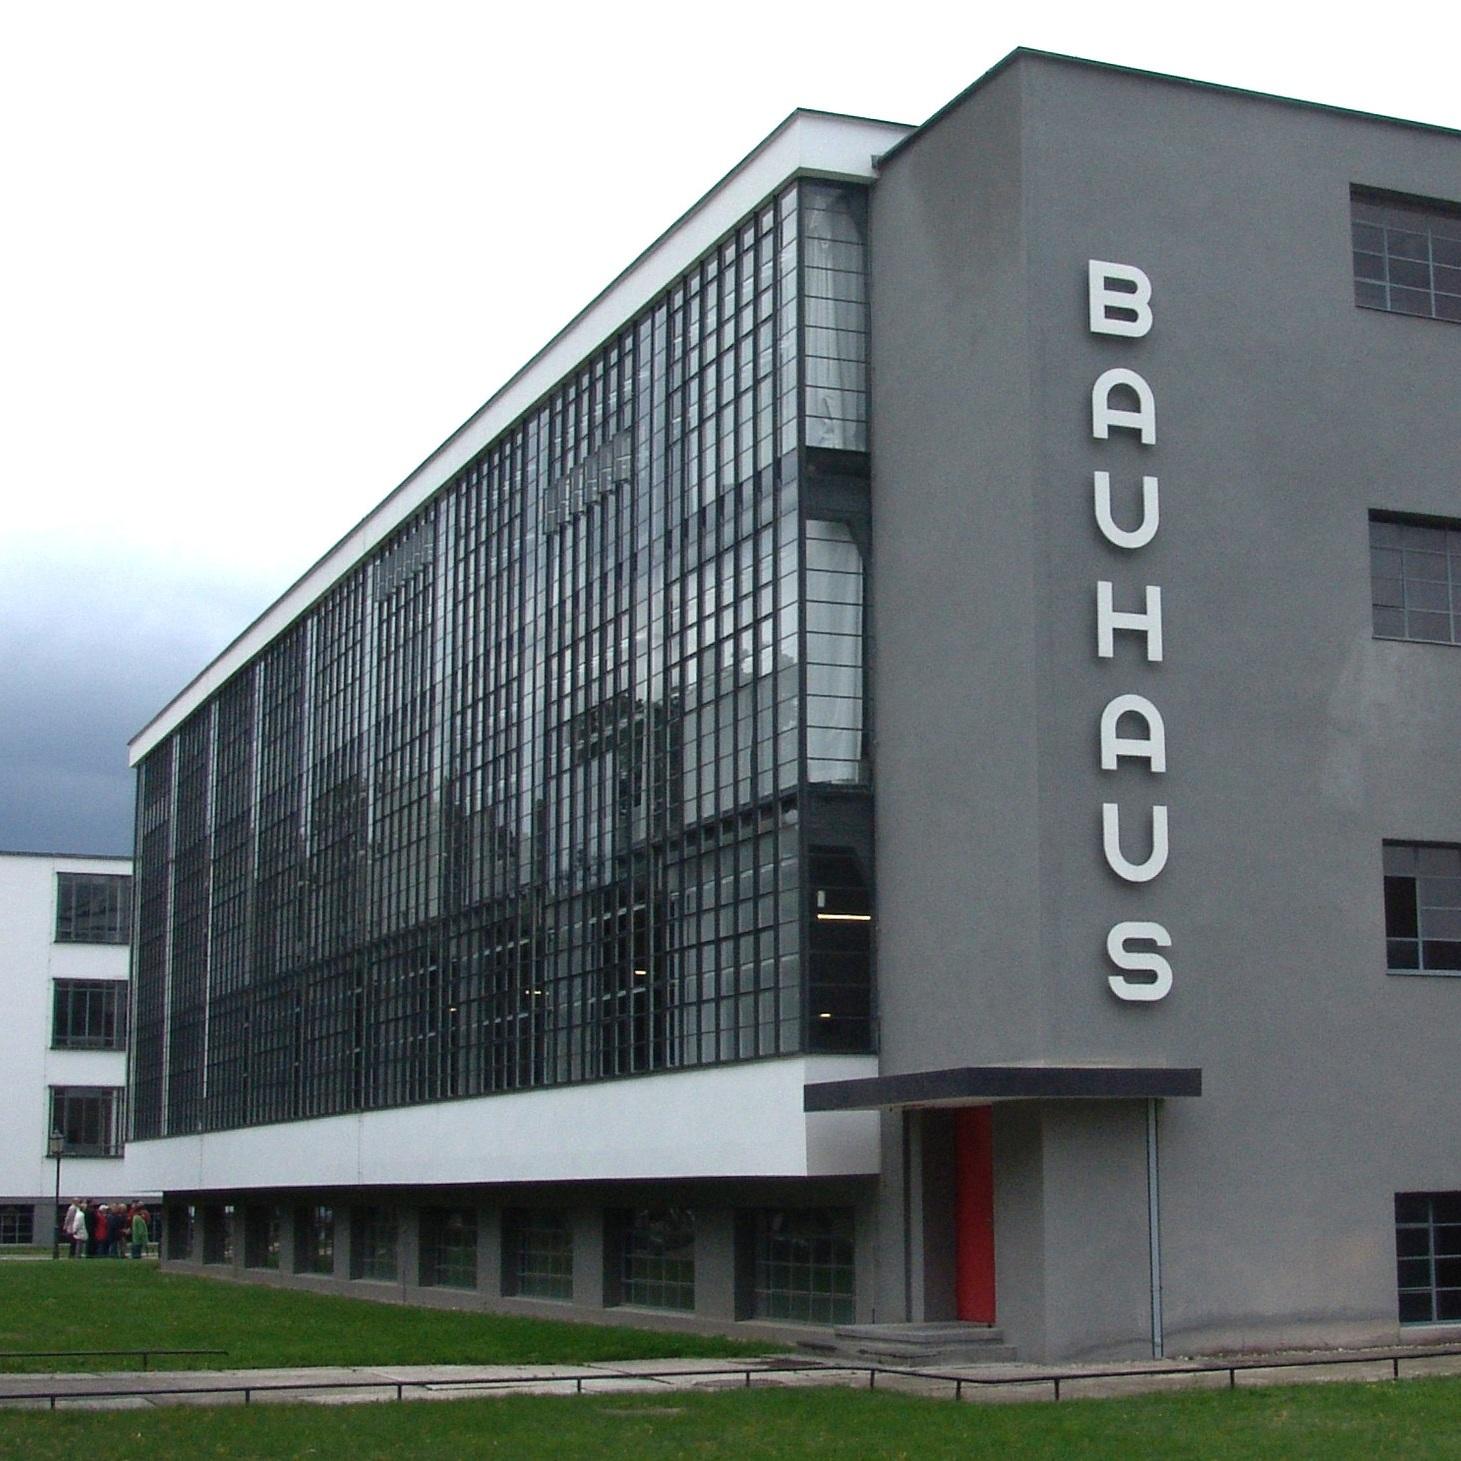 Bauhaus_Dessau-001.jpg